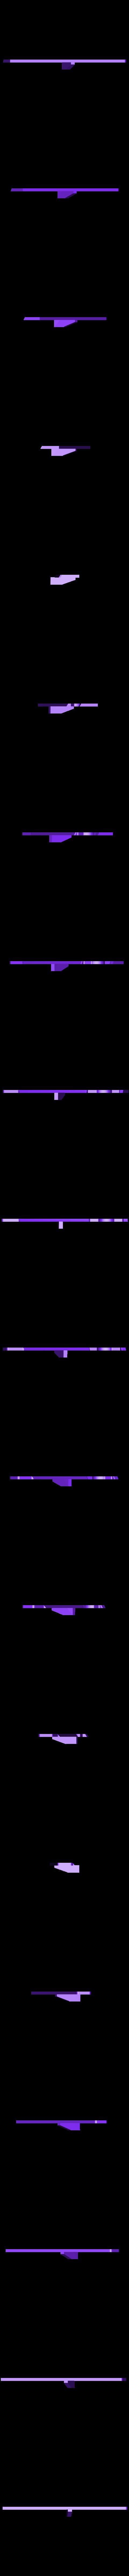 Run_Board_Front-A.STL Download free STL file 4-8-8-4 Big Boy Locomotive • 3D printer object, RaymondDeLuca